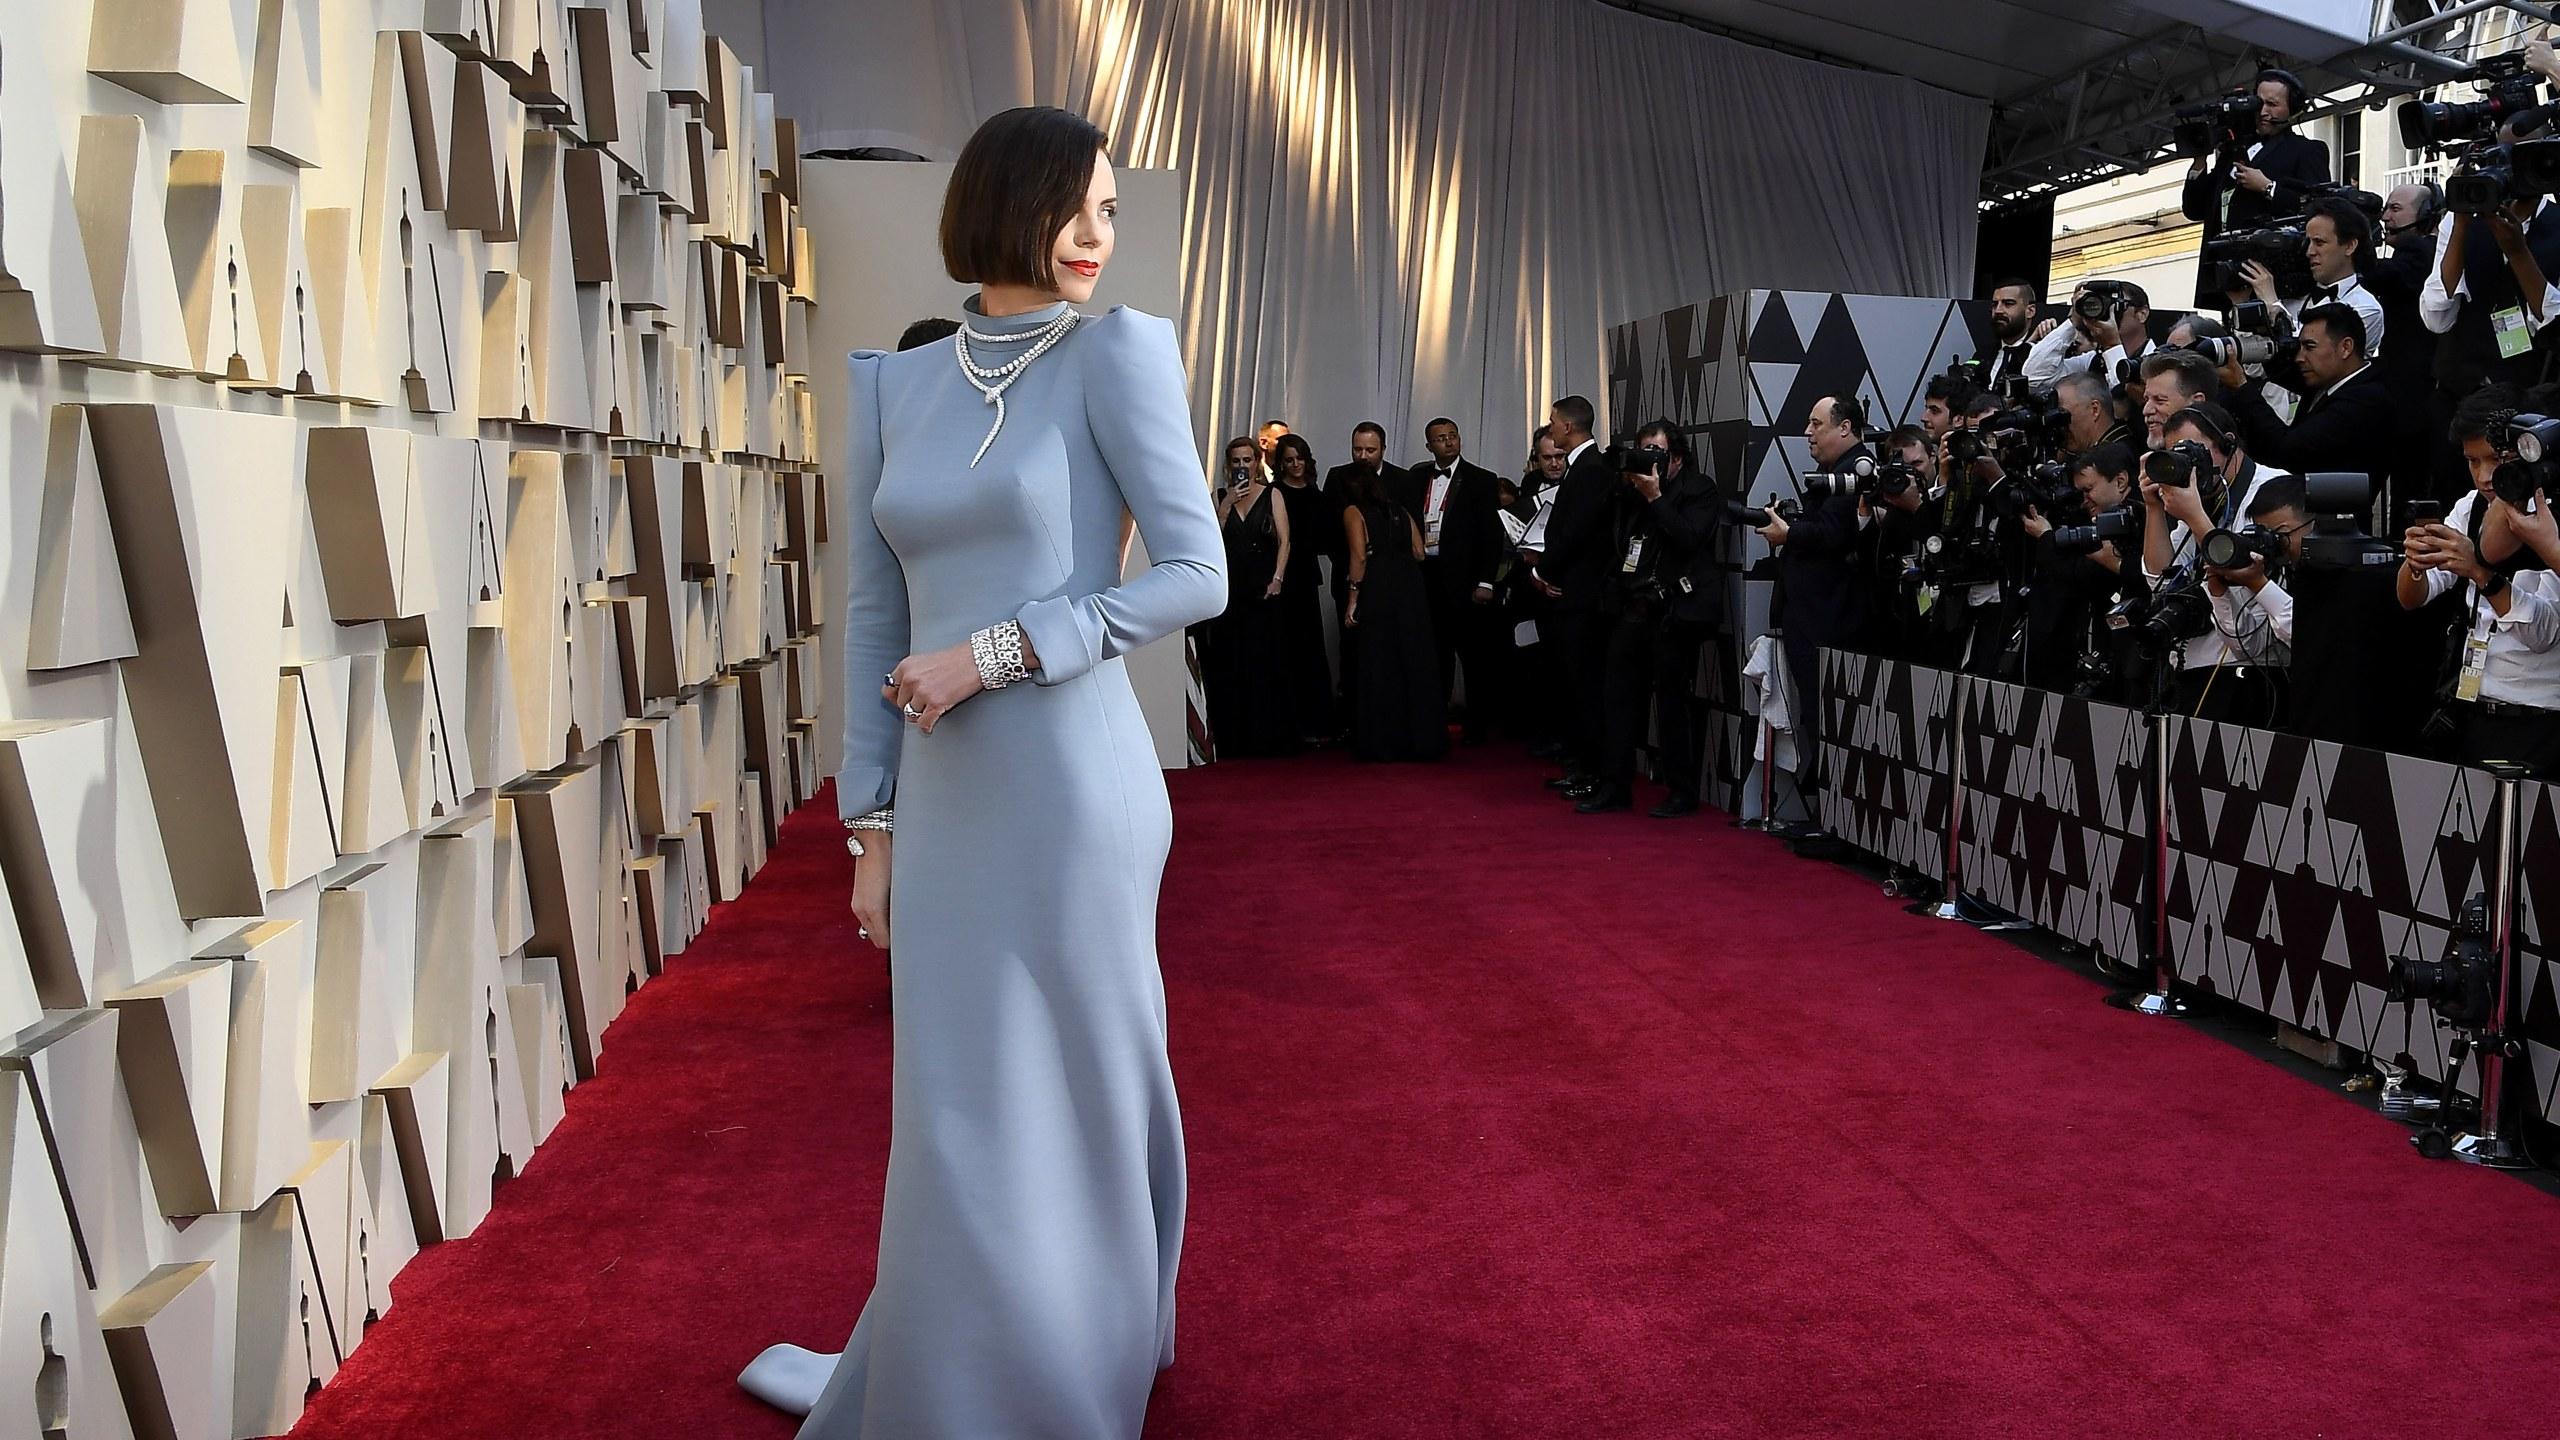 Oscars 2020 How to Livestream Watch the 2020 Oscars Live Glamour 2560x1440